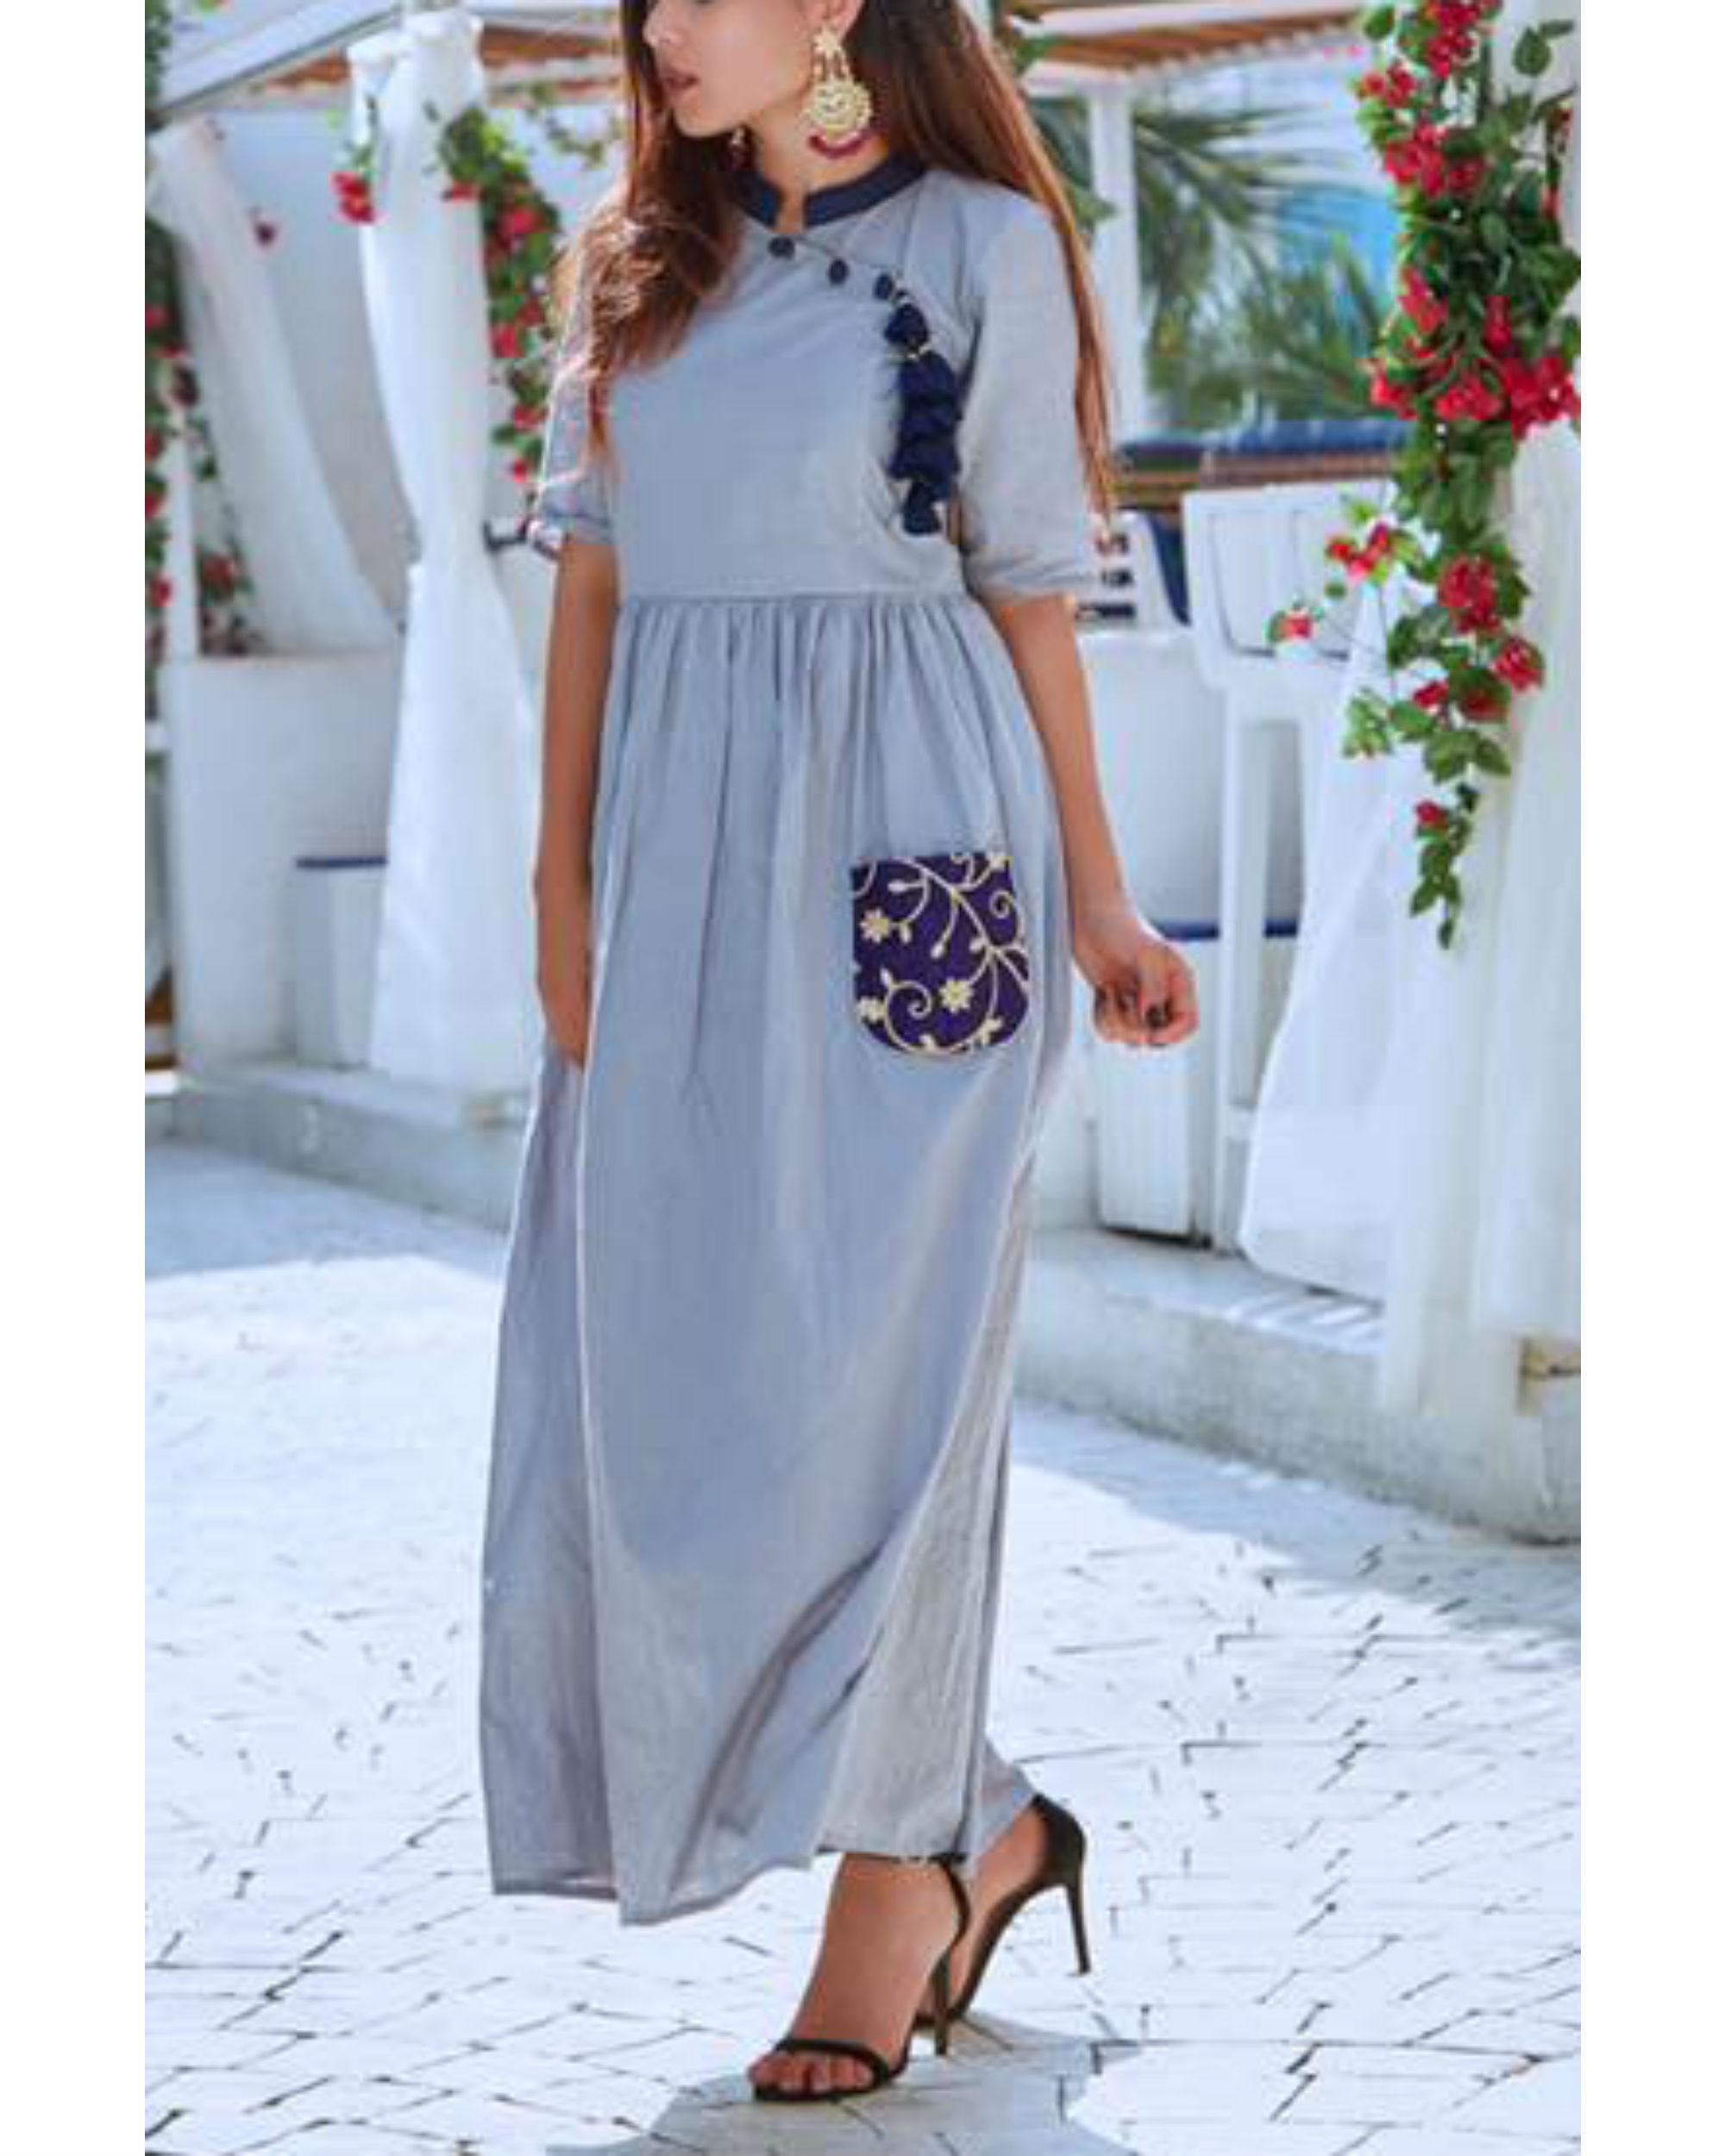 Ash grey pocket dress